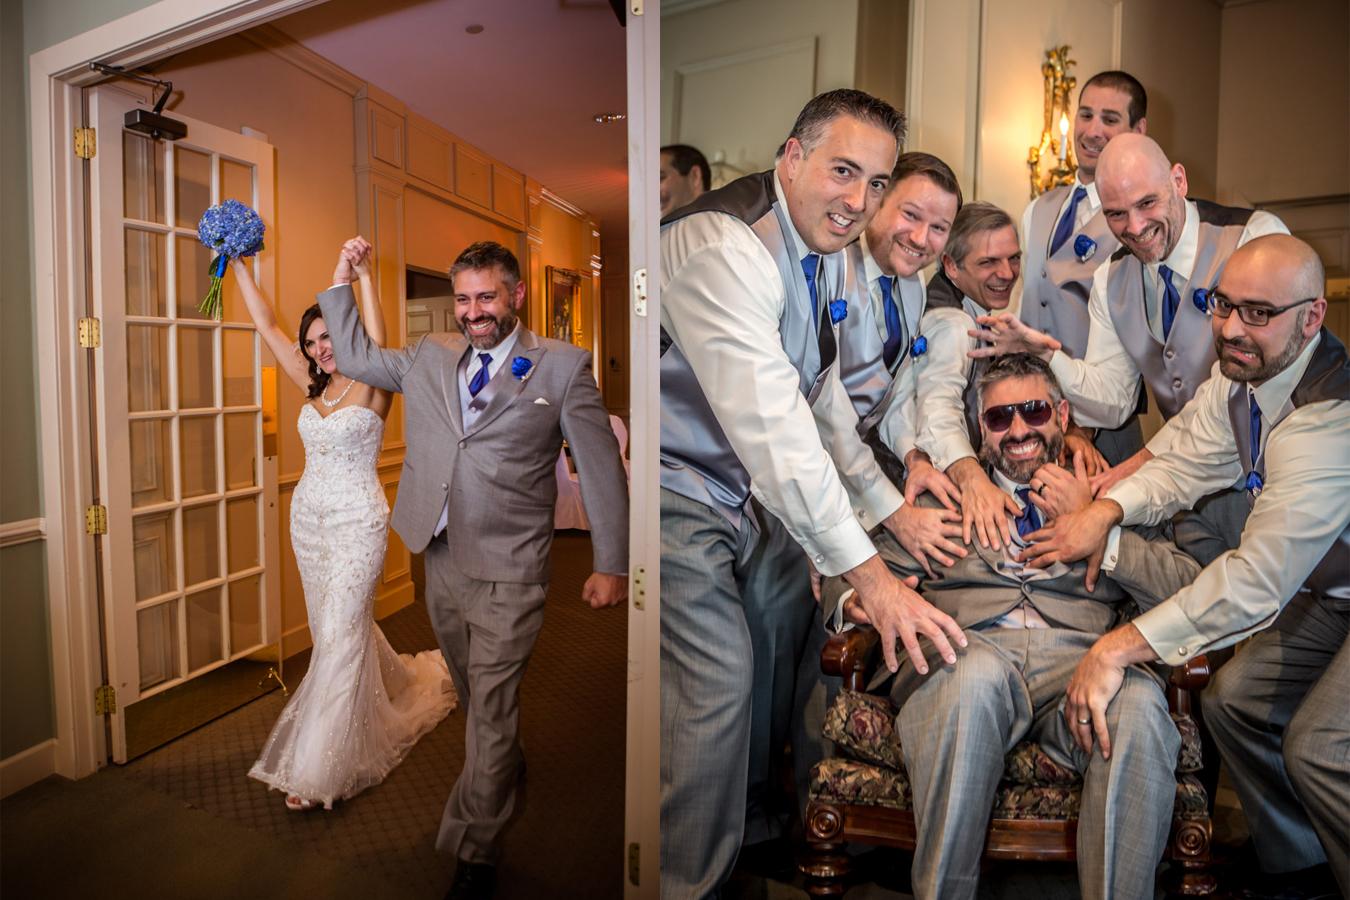 NEPA_Pocono_Weddings_Rob_Lettieri_Photography_13.jpg